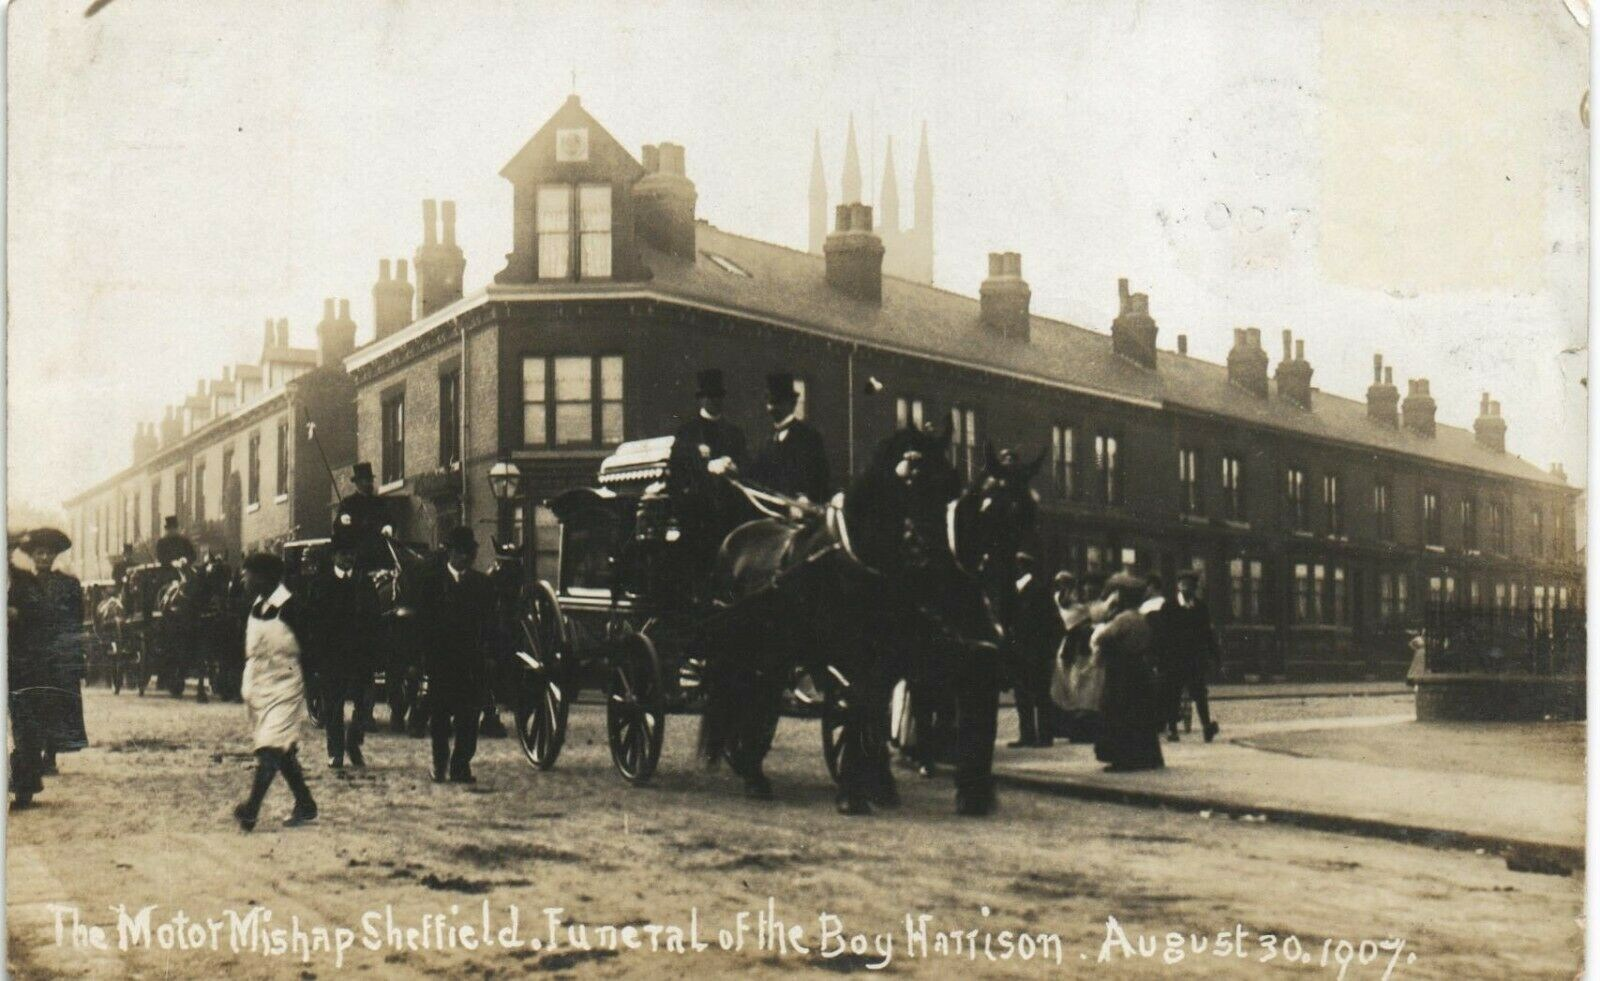 motor_mishap_funeral_boy_harrison_30th_august_1907.jpg